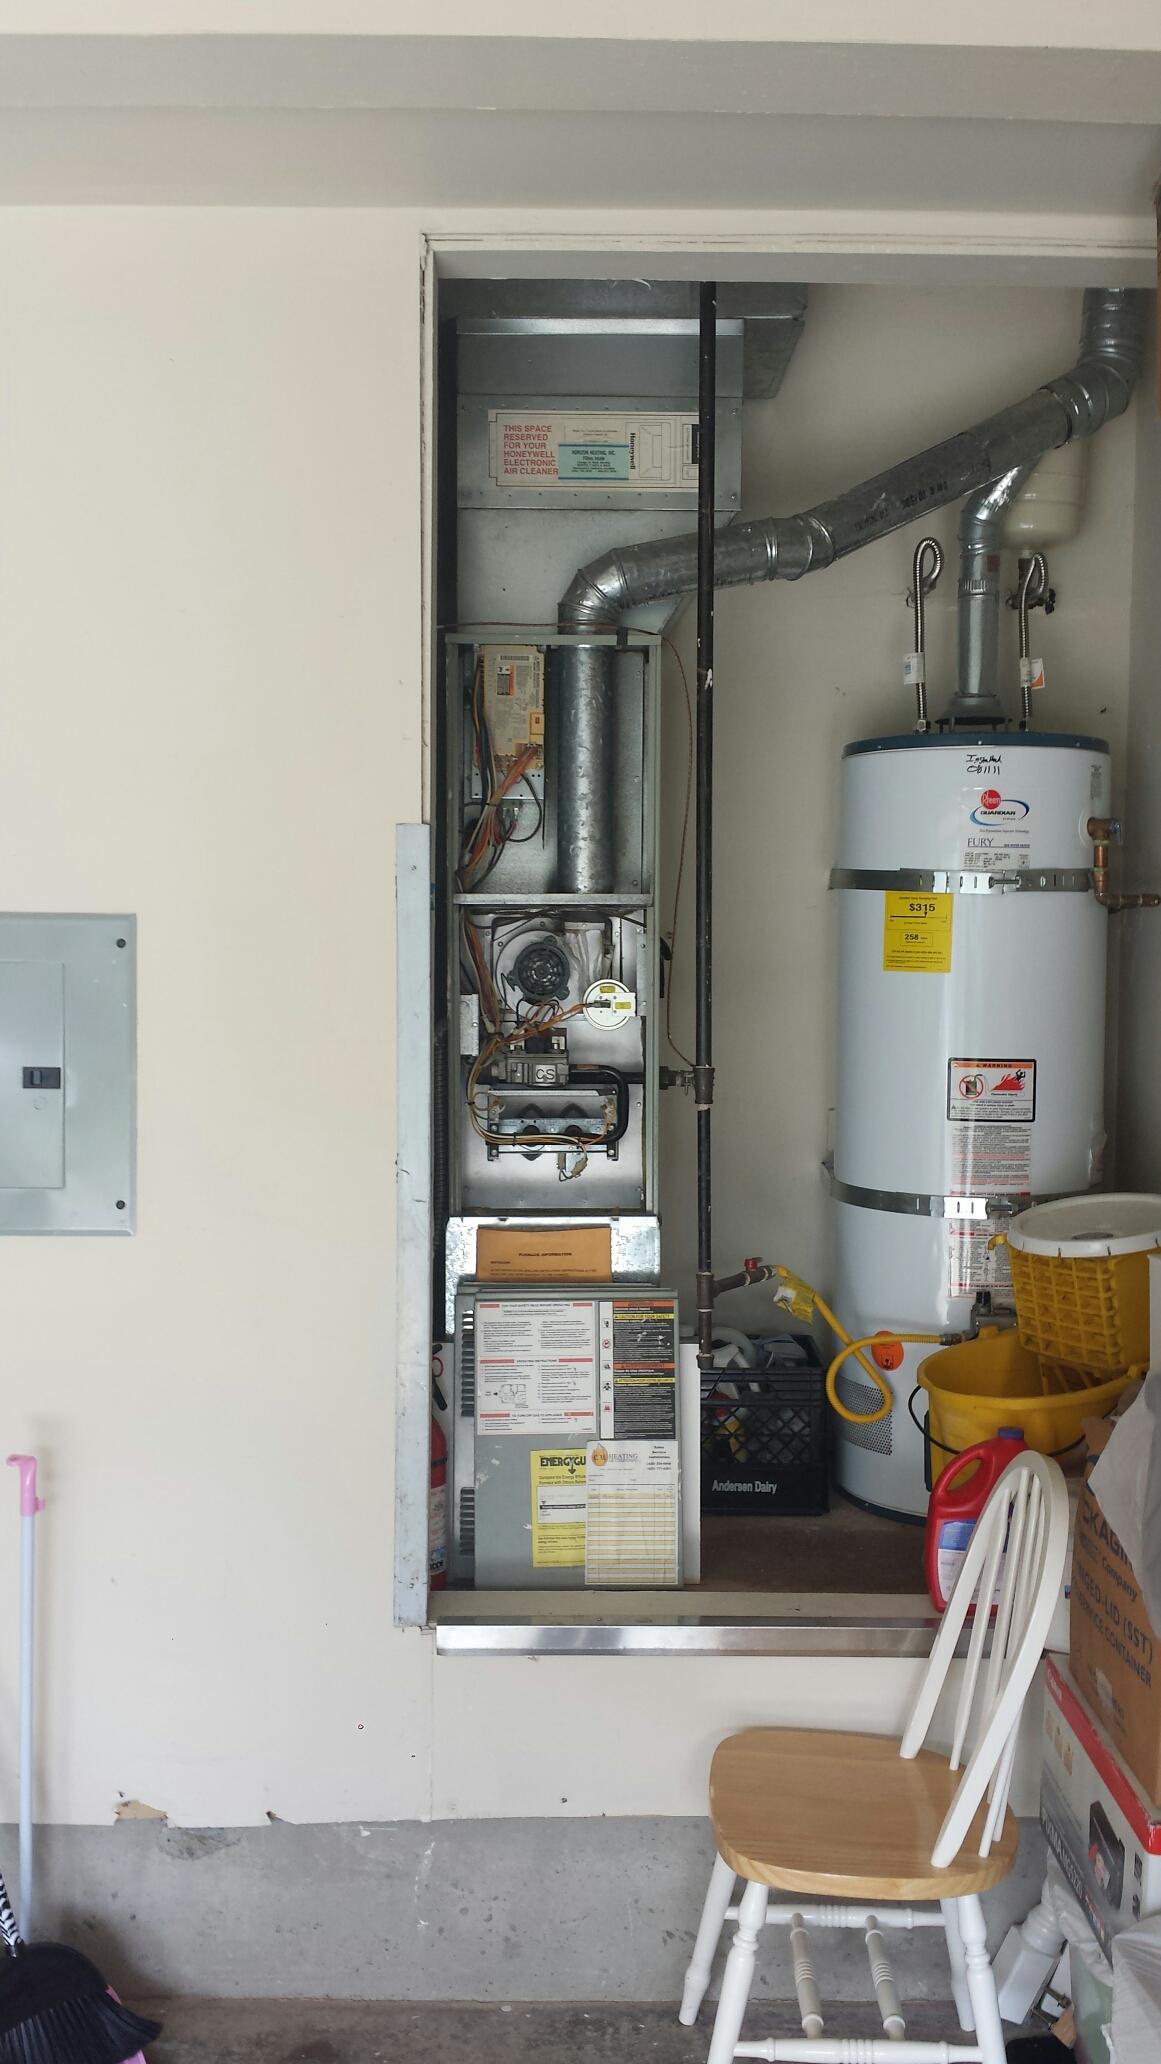 Repairing Trane furnace in Mukilteo.